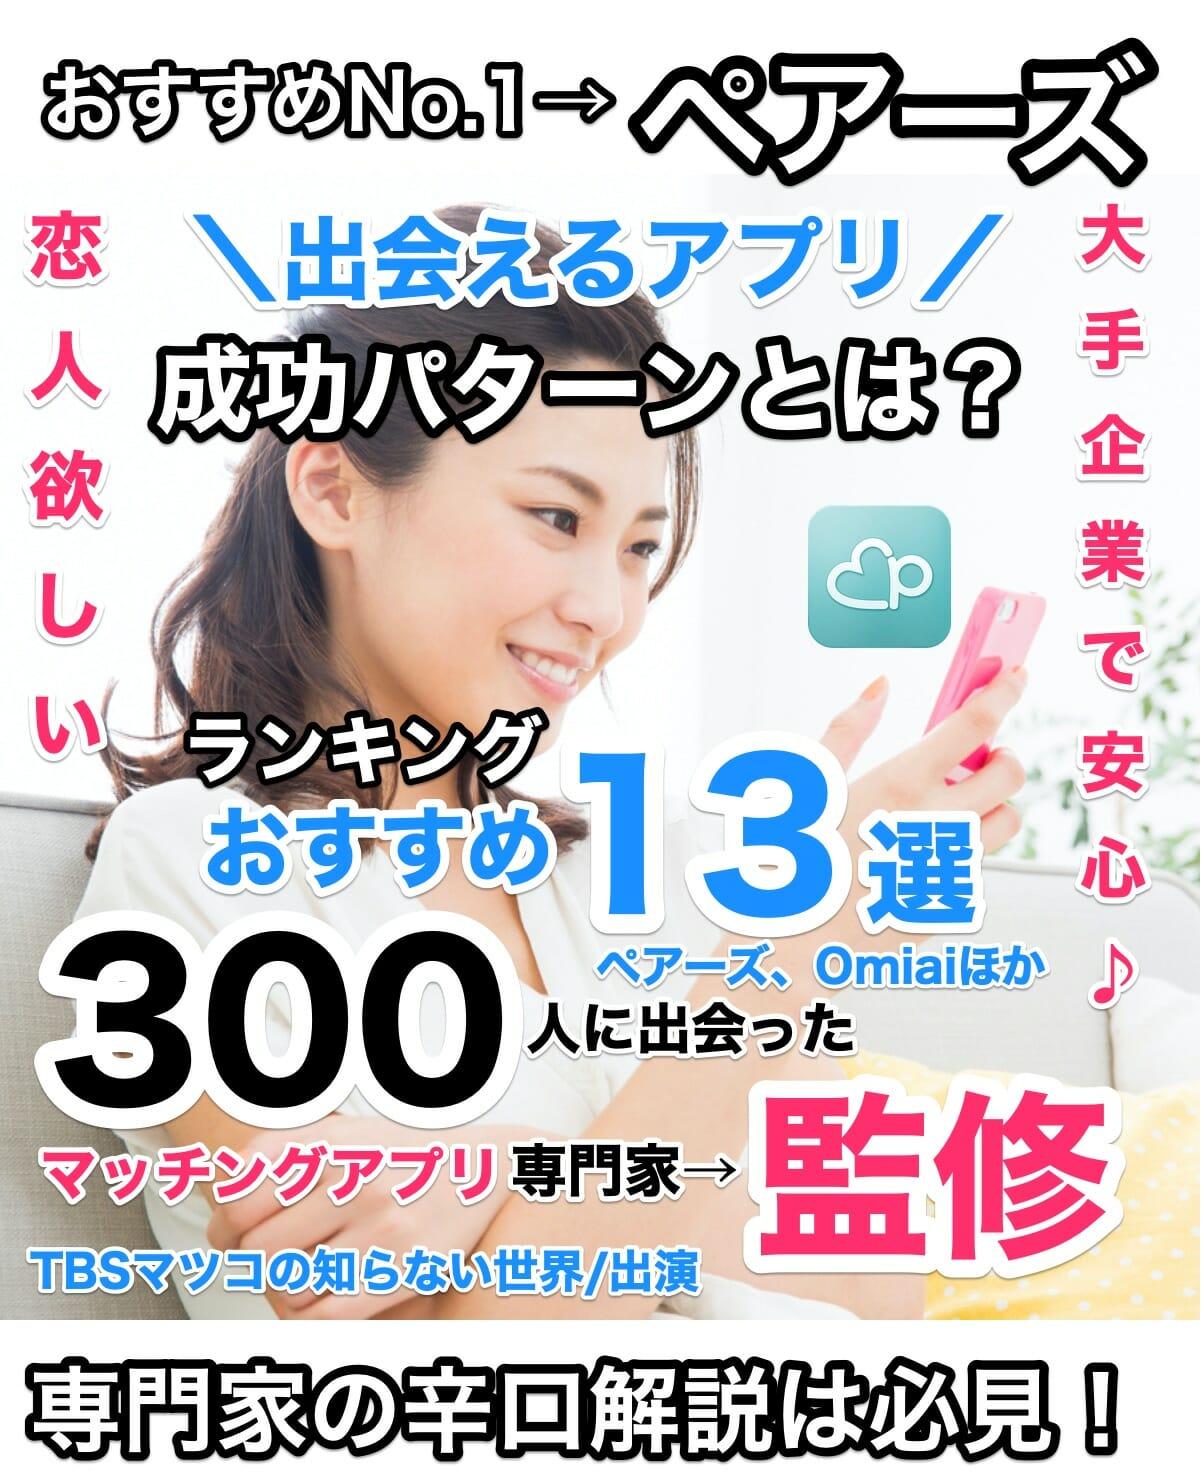 【TV出演/専門家監修】人気マッチングアプリ比較13選・300人出会った成功パターンを解説